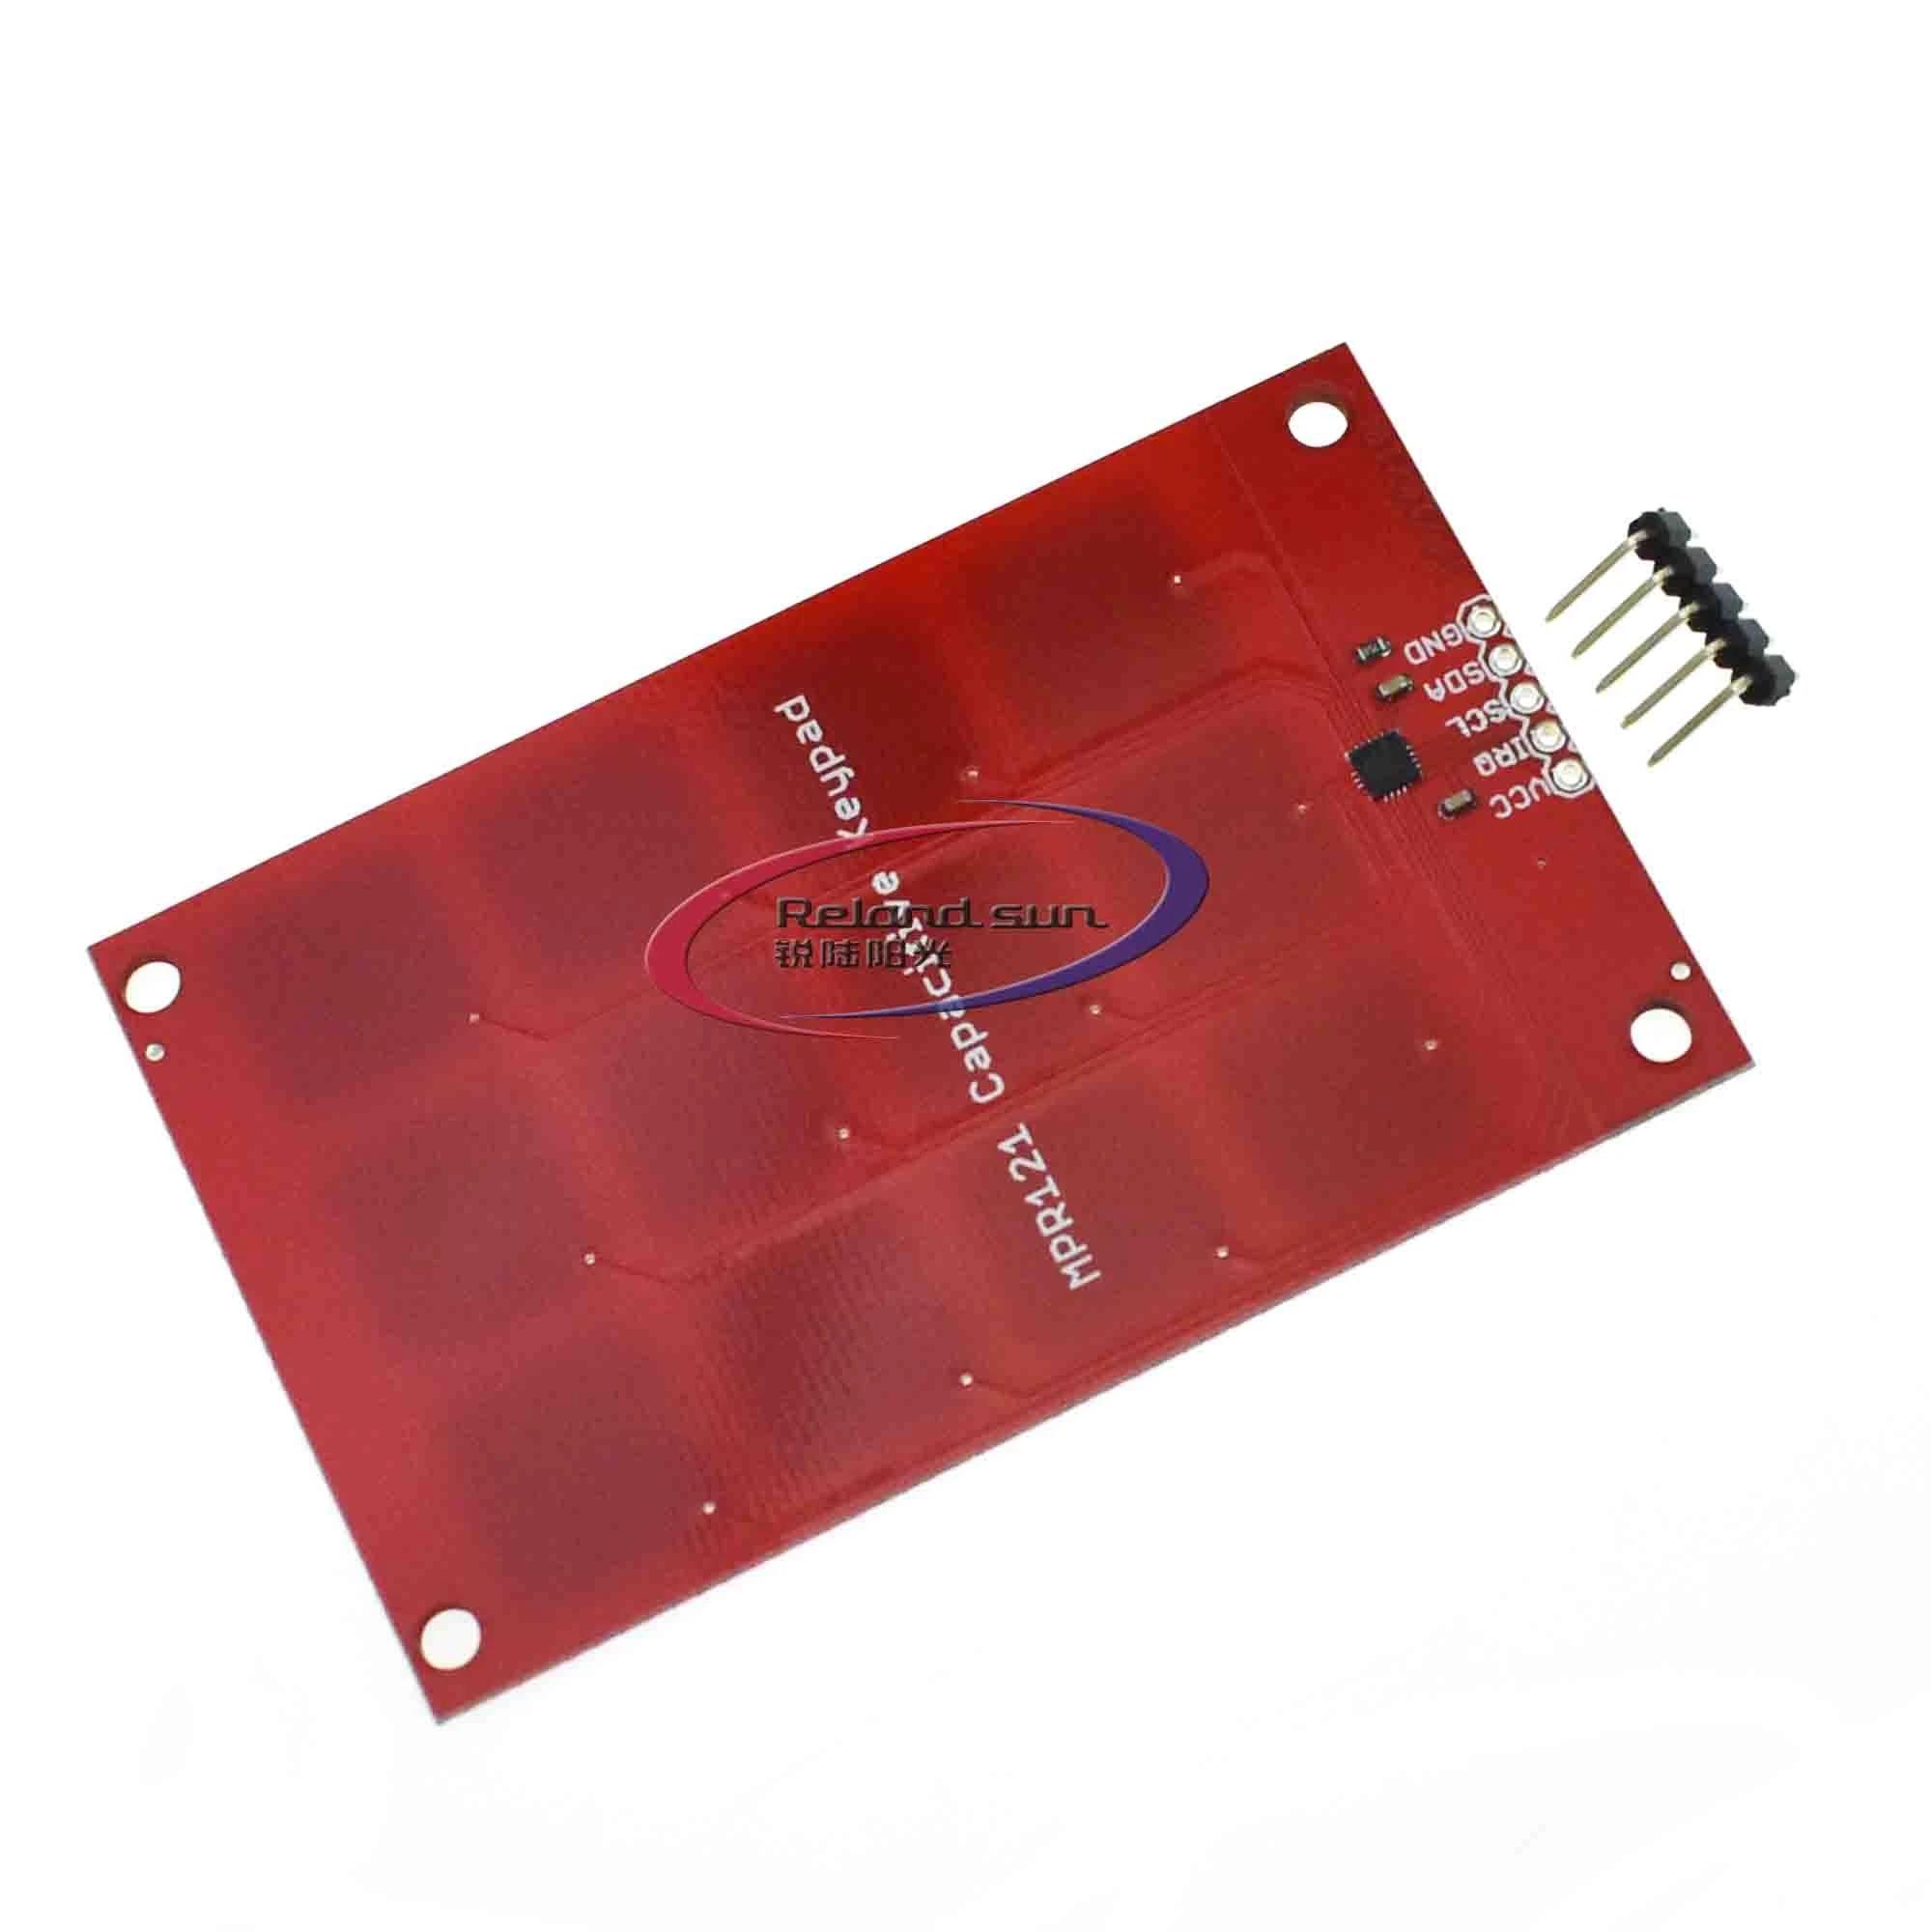 Balance World Inc 1Pcs MPR121 CJMCU-122 Capacitive Touch Sensor Buttons Keys Module for Arduino SS